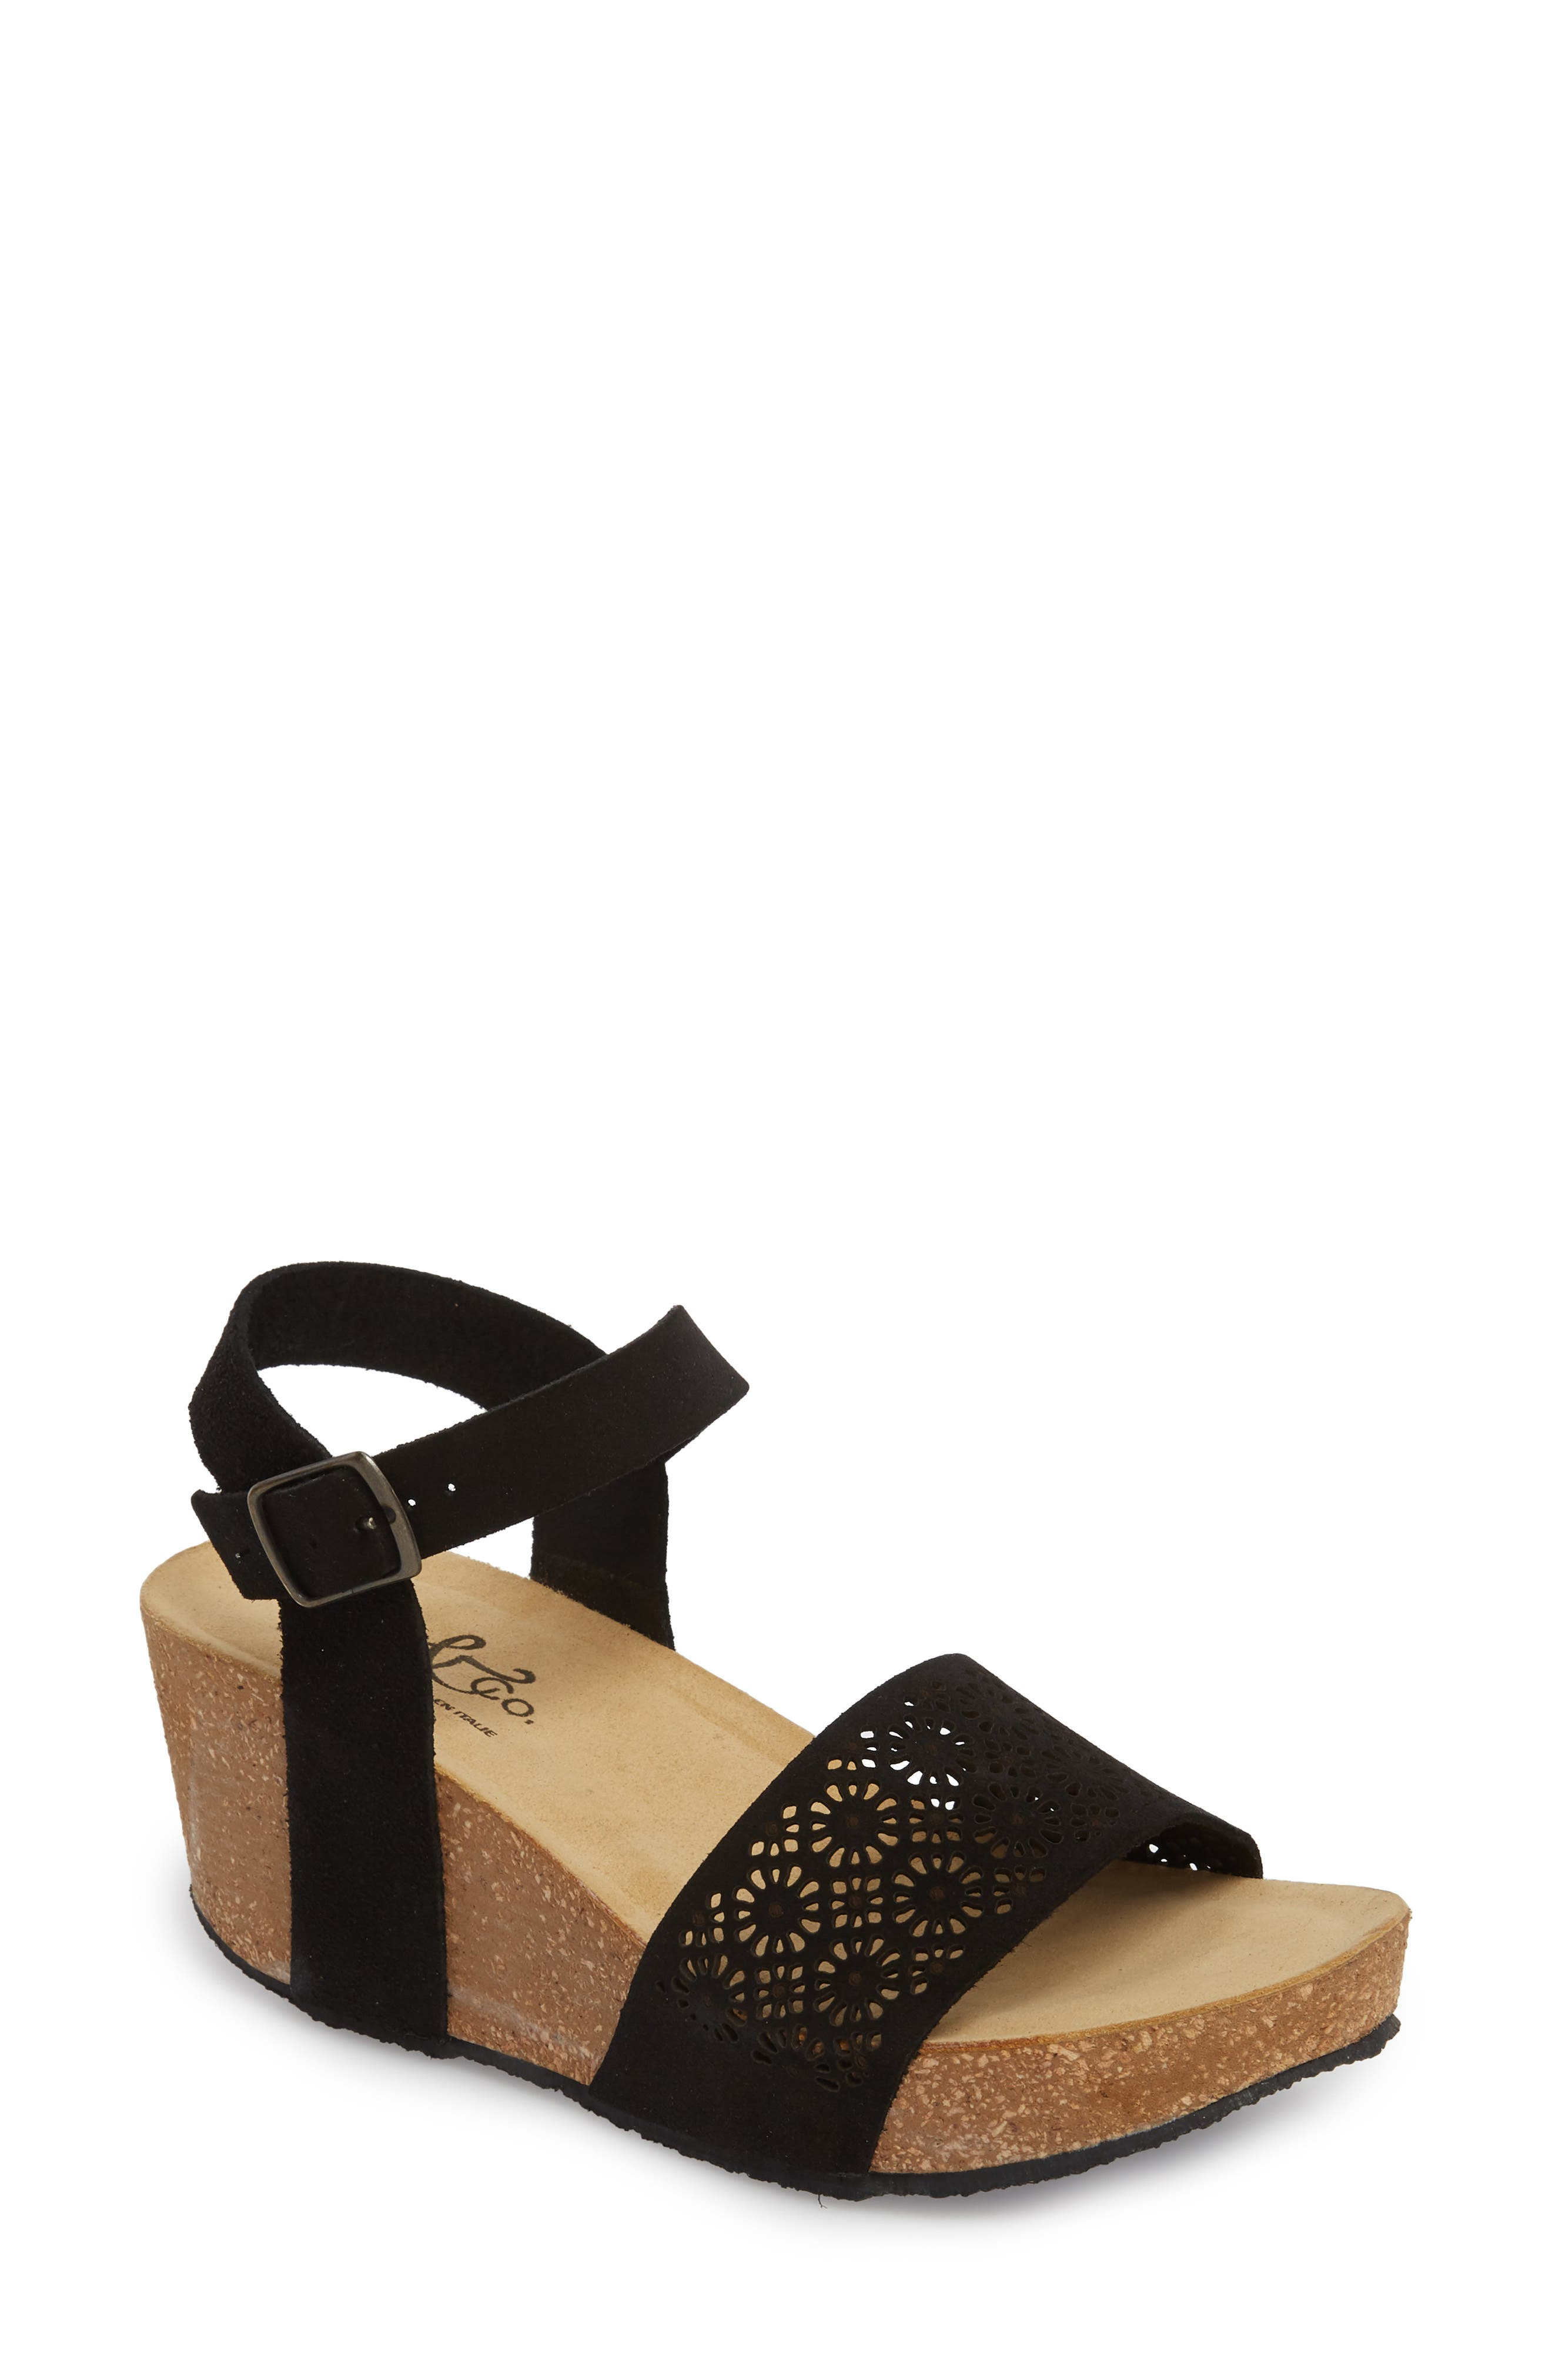 Lolo Platform Wedge Sandal,                             Main thumbnail 1, color,                             BLACK SUEDE